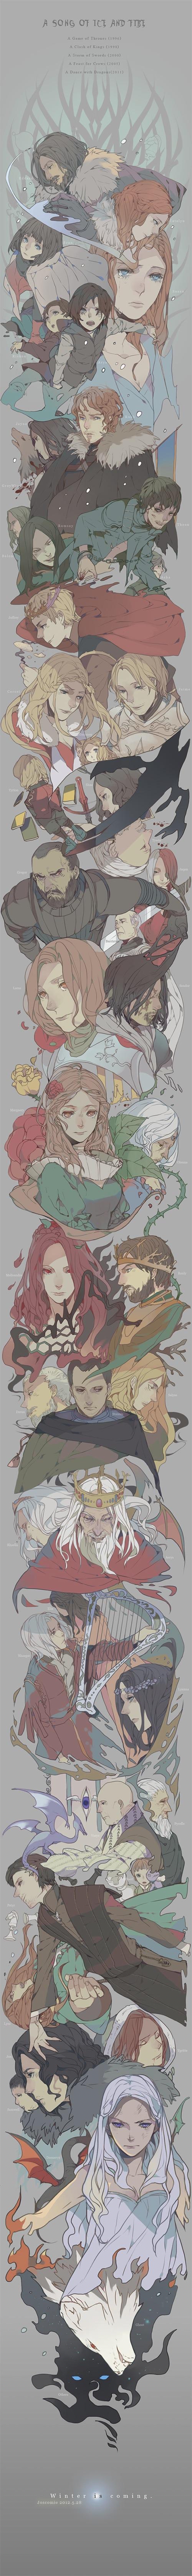 Epic GAME OF THRONES Anime Style Scroll Art u2014 GeekTyrant